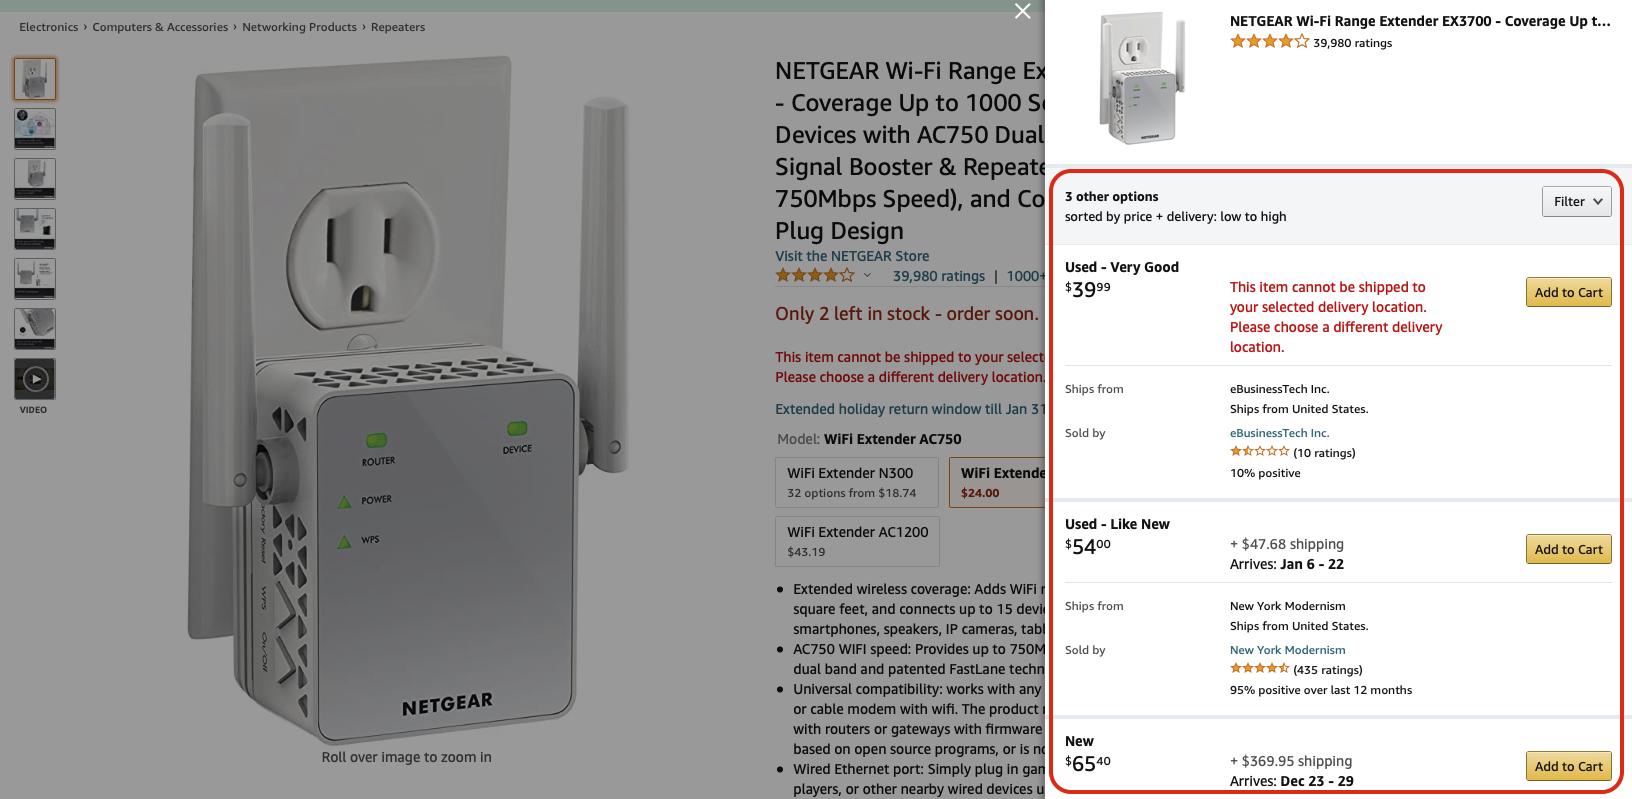 Gợi ý các sản phẩm tương tự trên Amazon. ©Amazon.